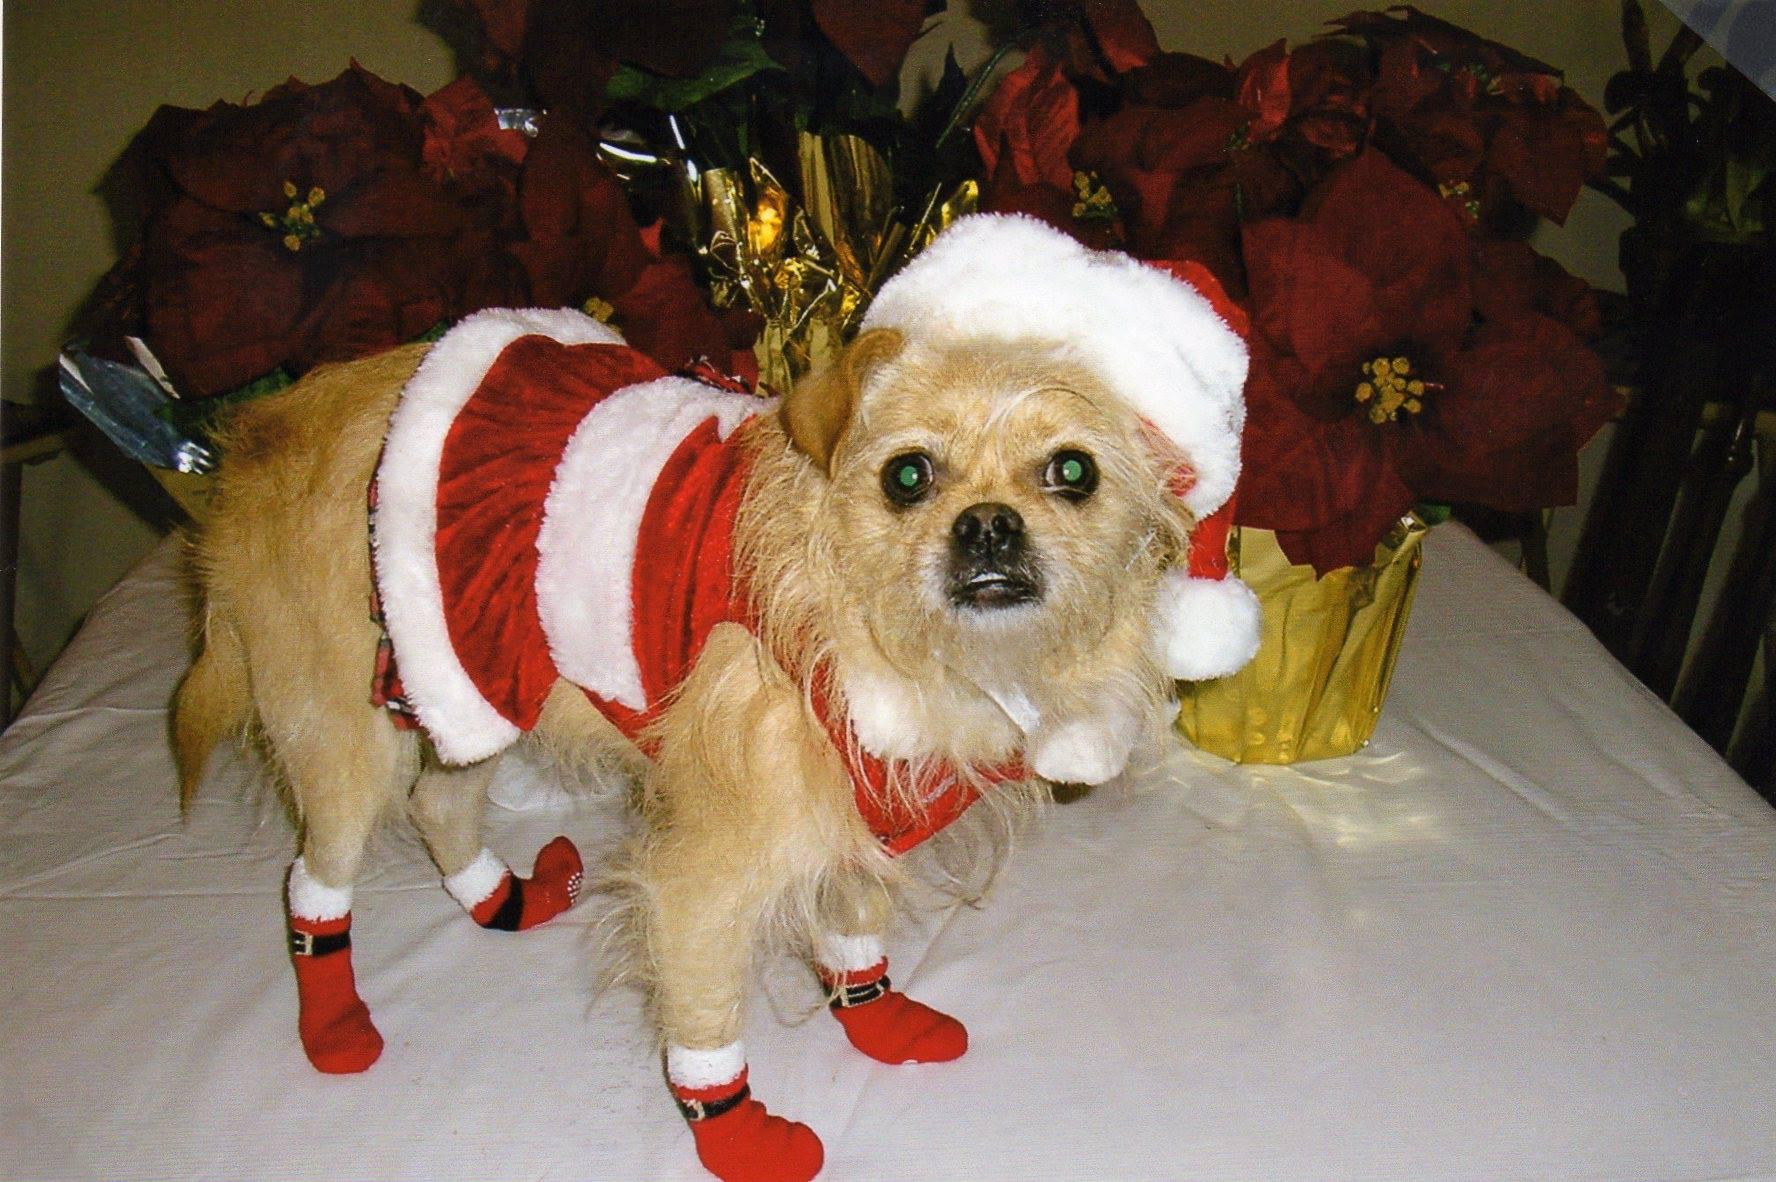 Sweet Haley is ready for Santa!